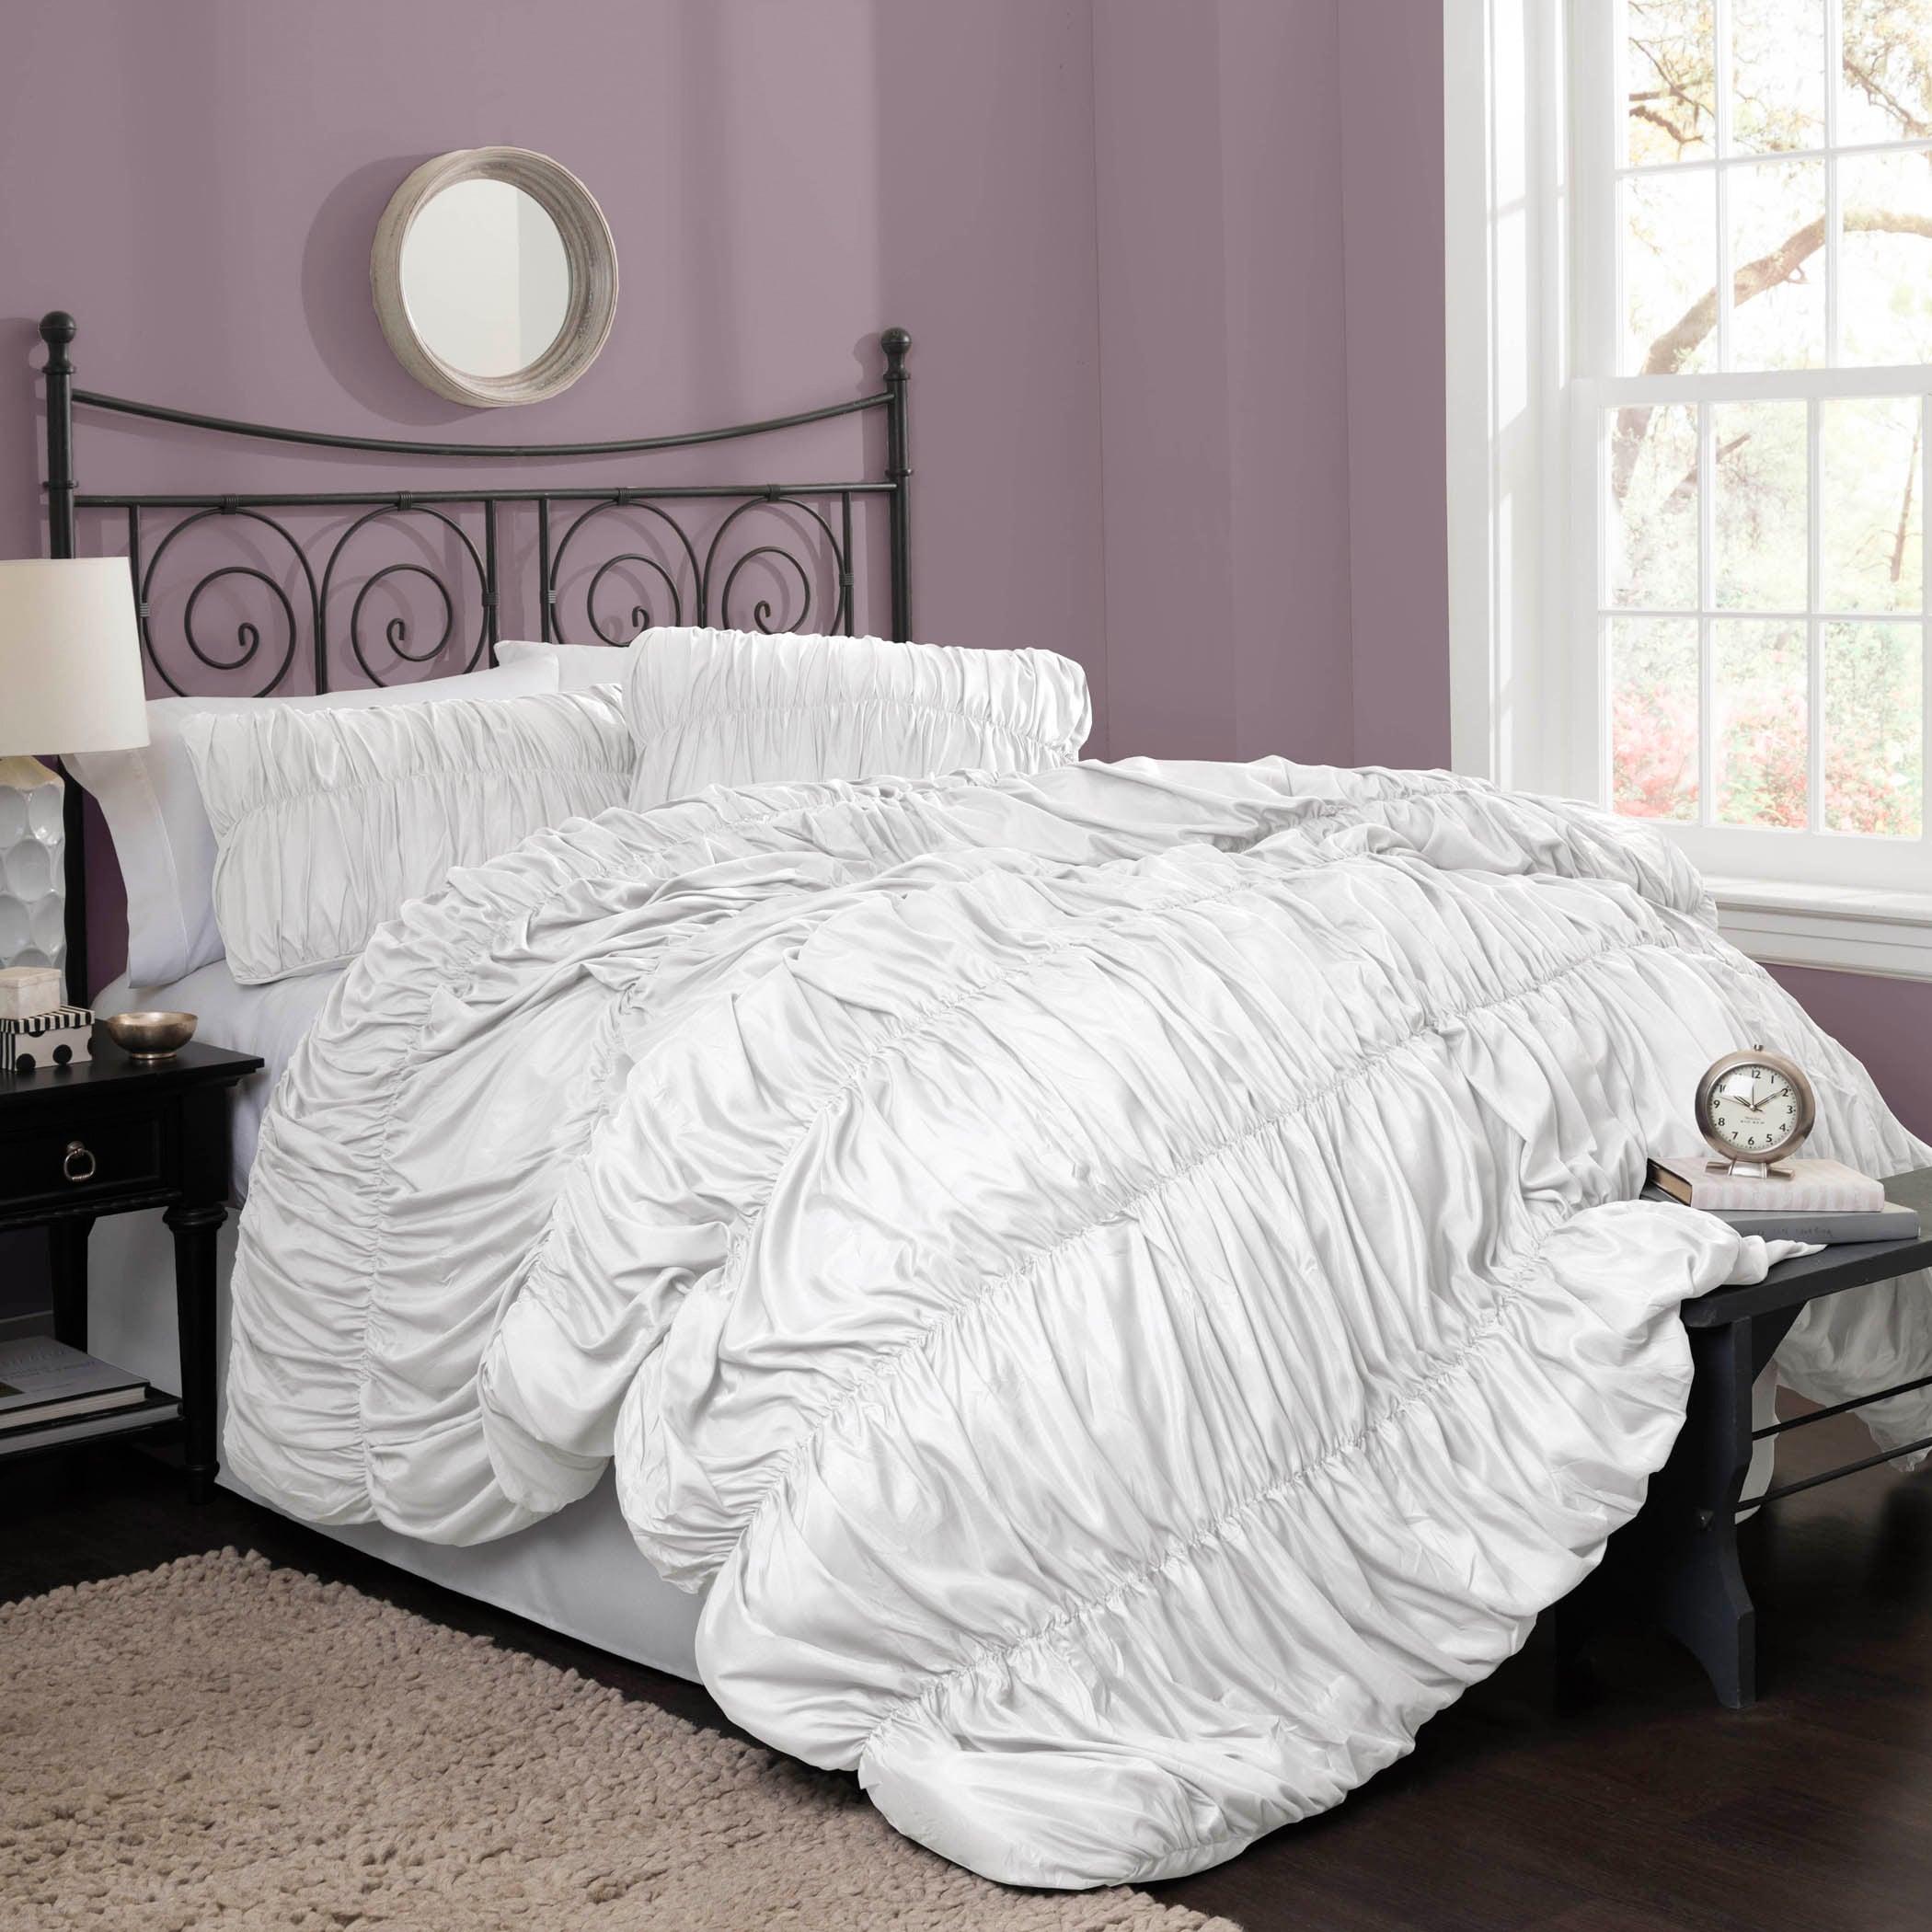 carbon free set product joyner bath scene overstock loft bedding com bed comforter ziggy shipping today city